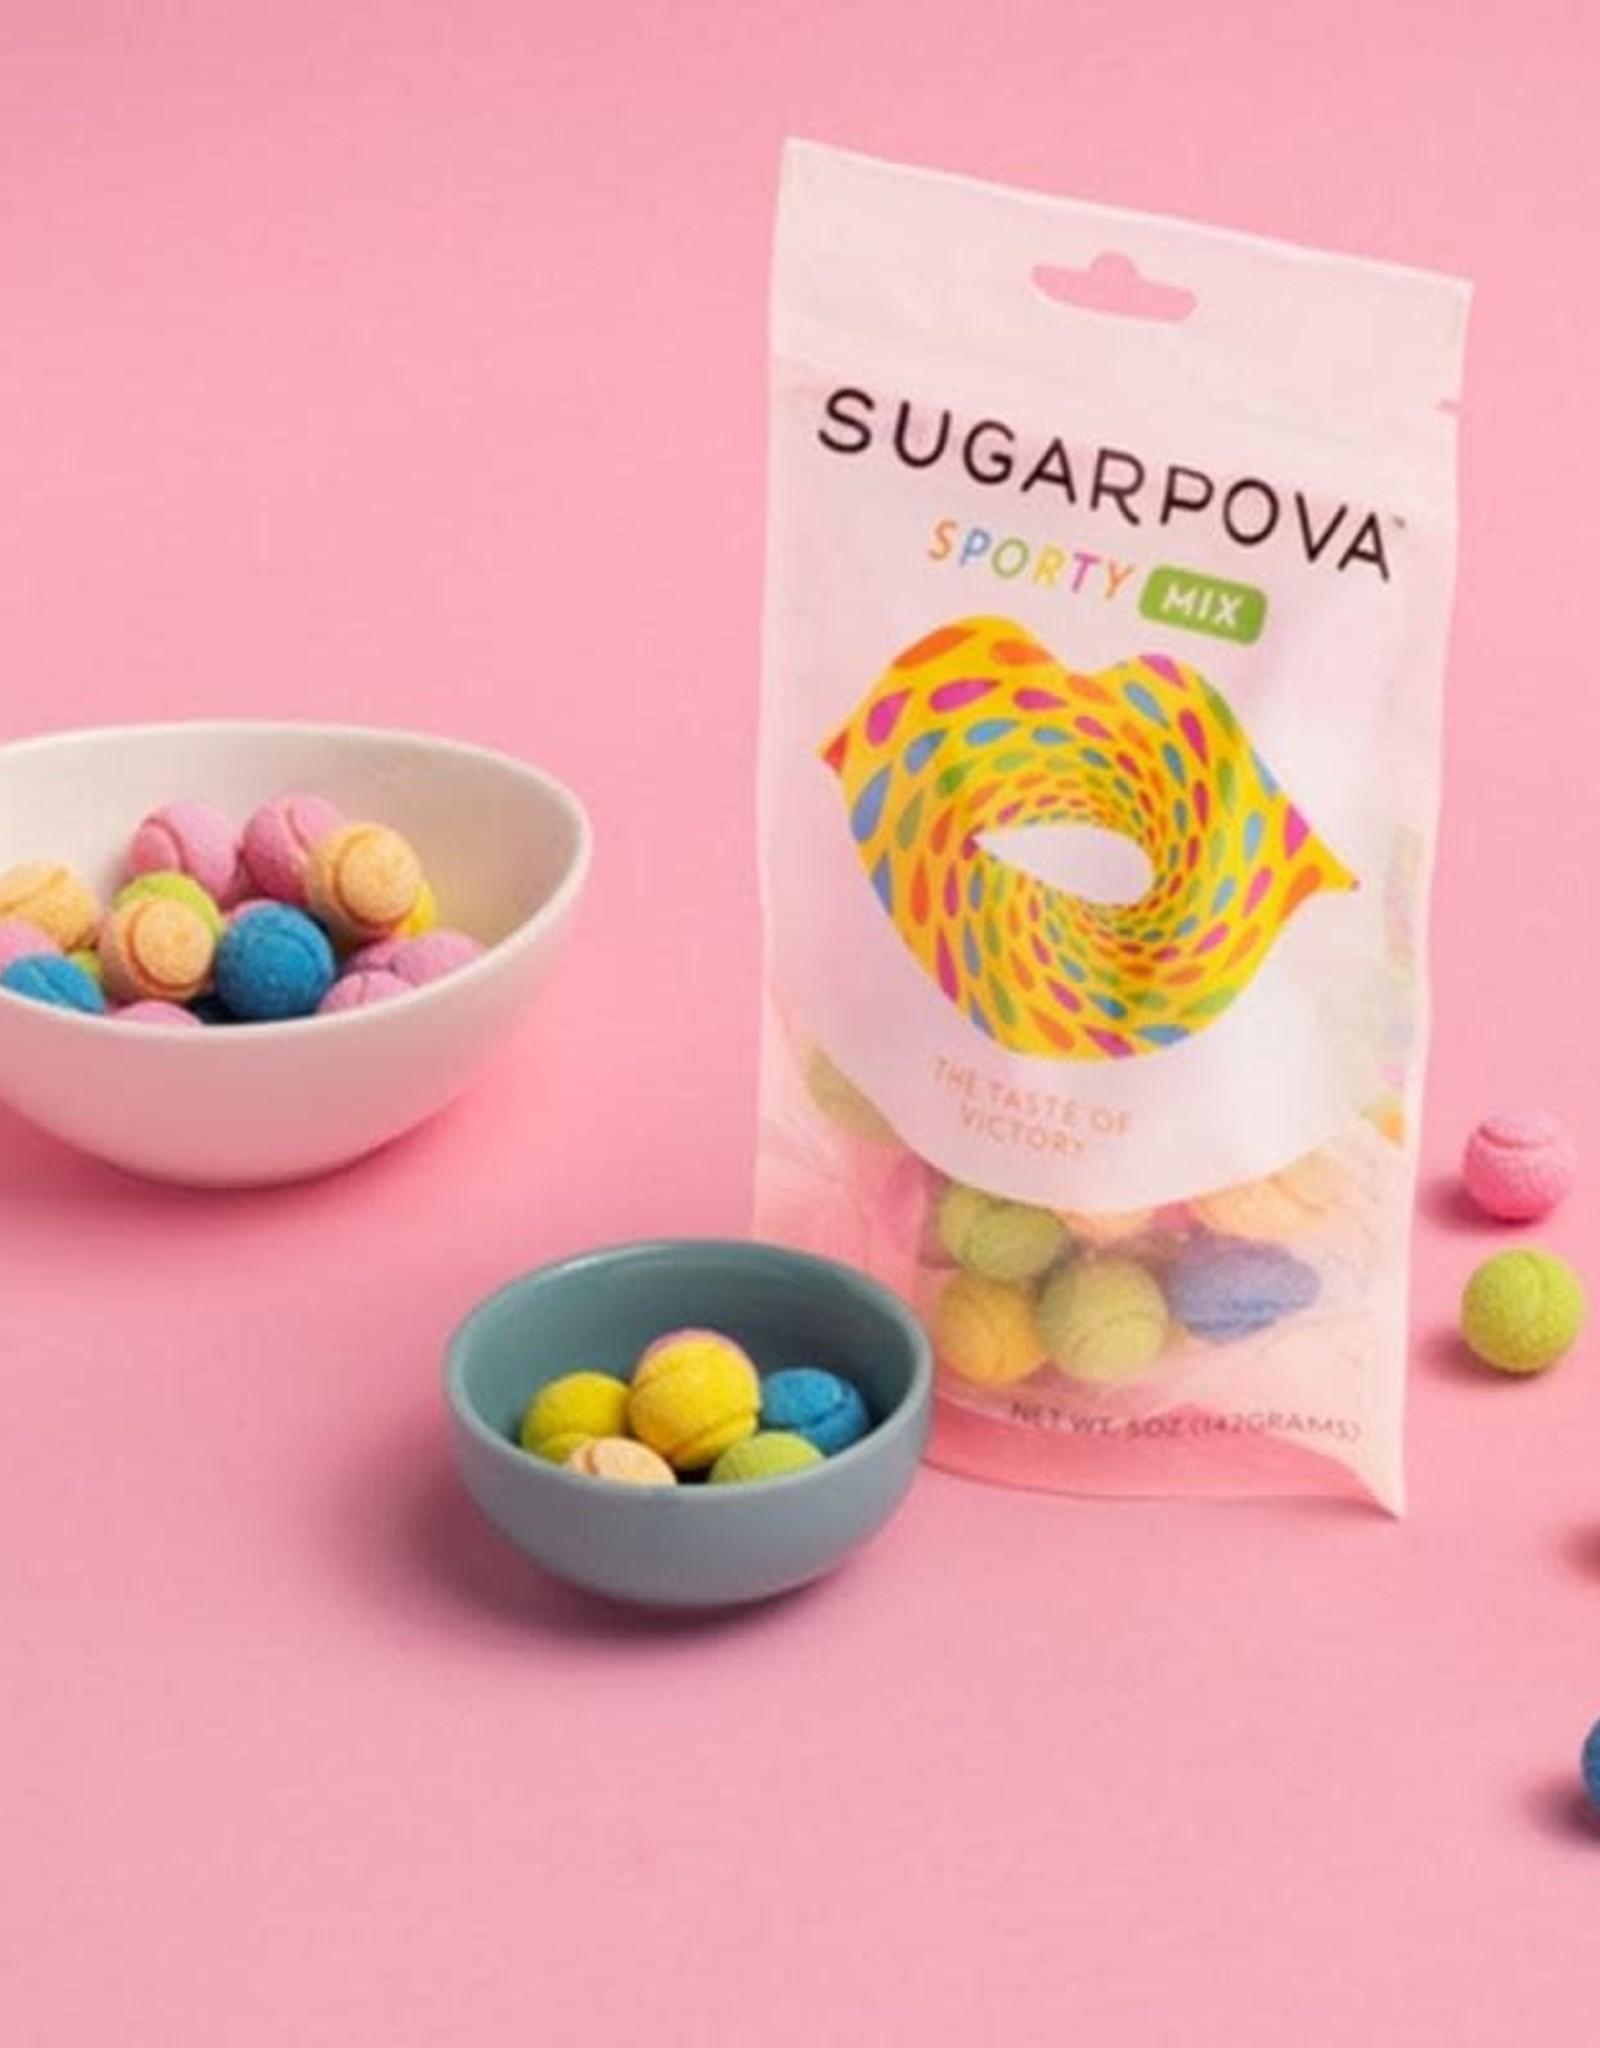 Sugarpova Sugarpova Sporty Mix Gumballs  5oz. Fruity